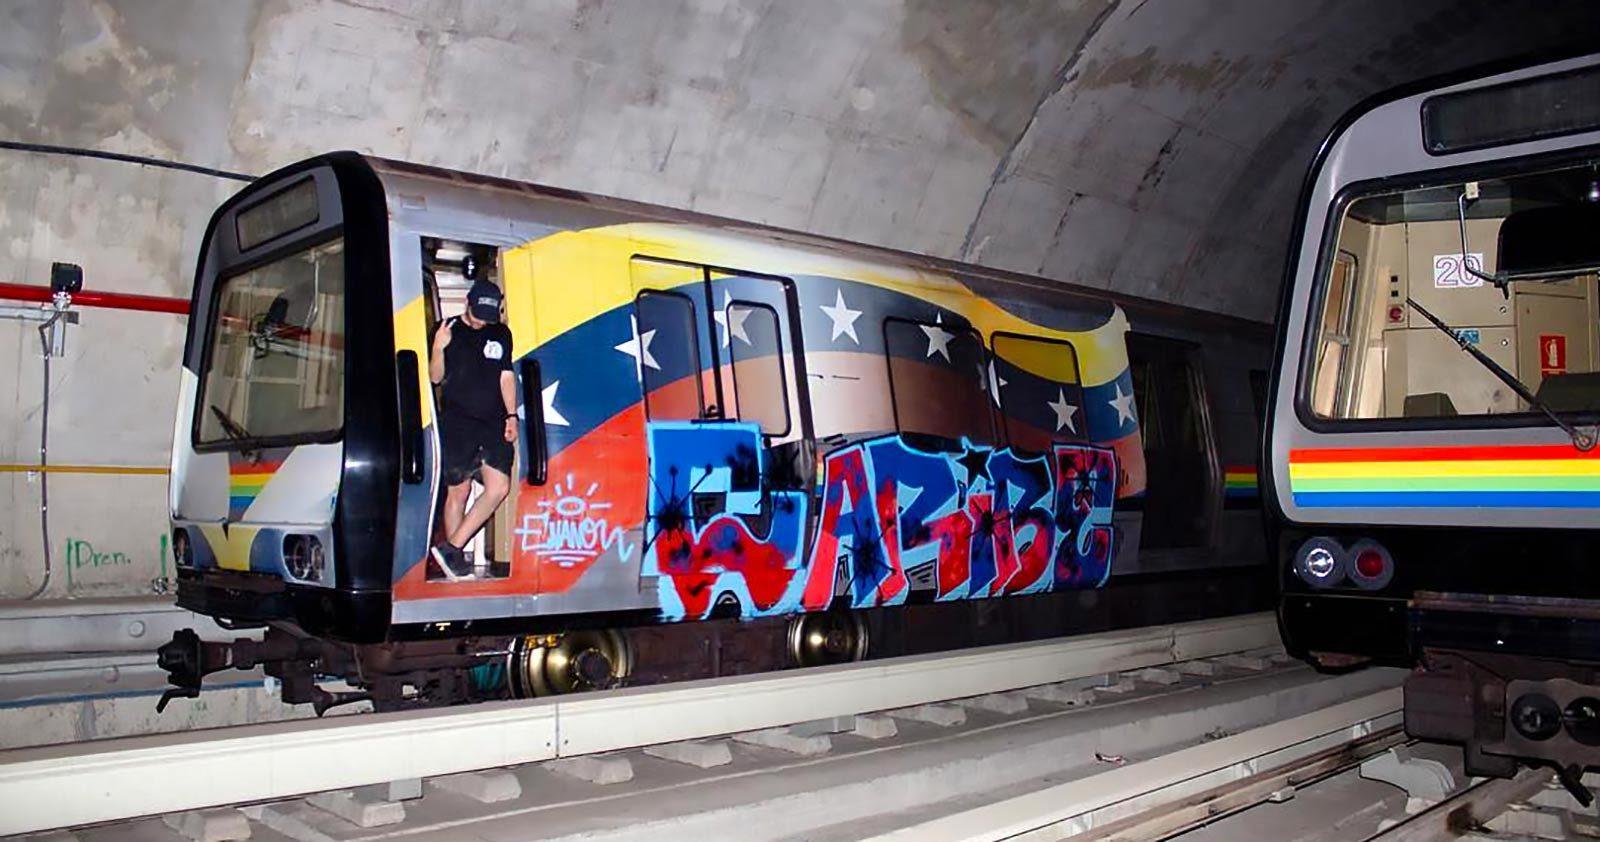 En transit avec les Caribes, les migrants du graffiti